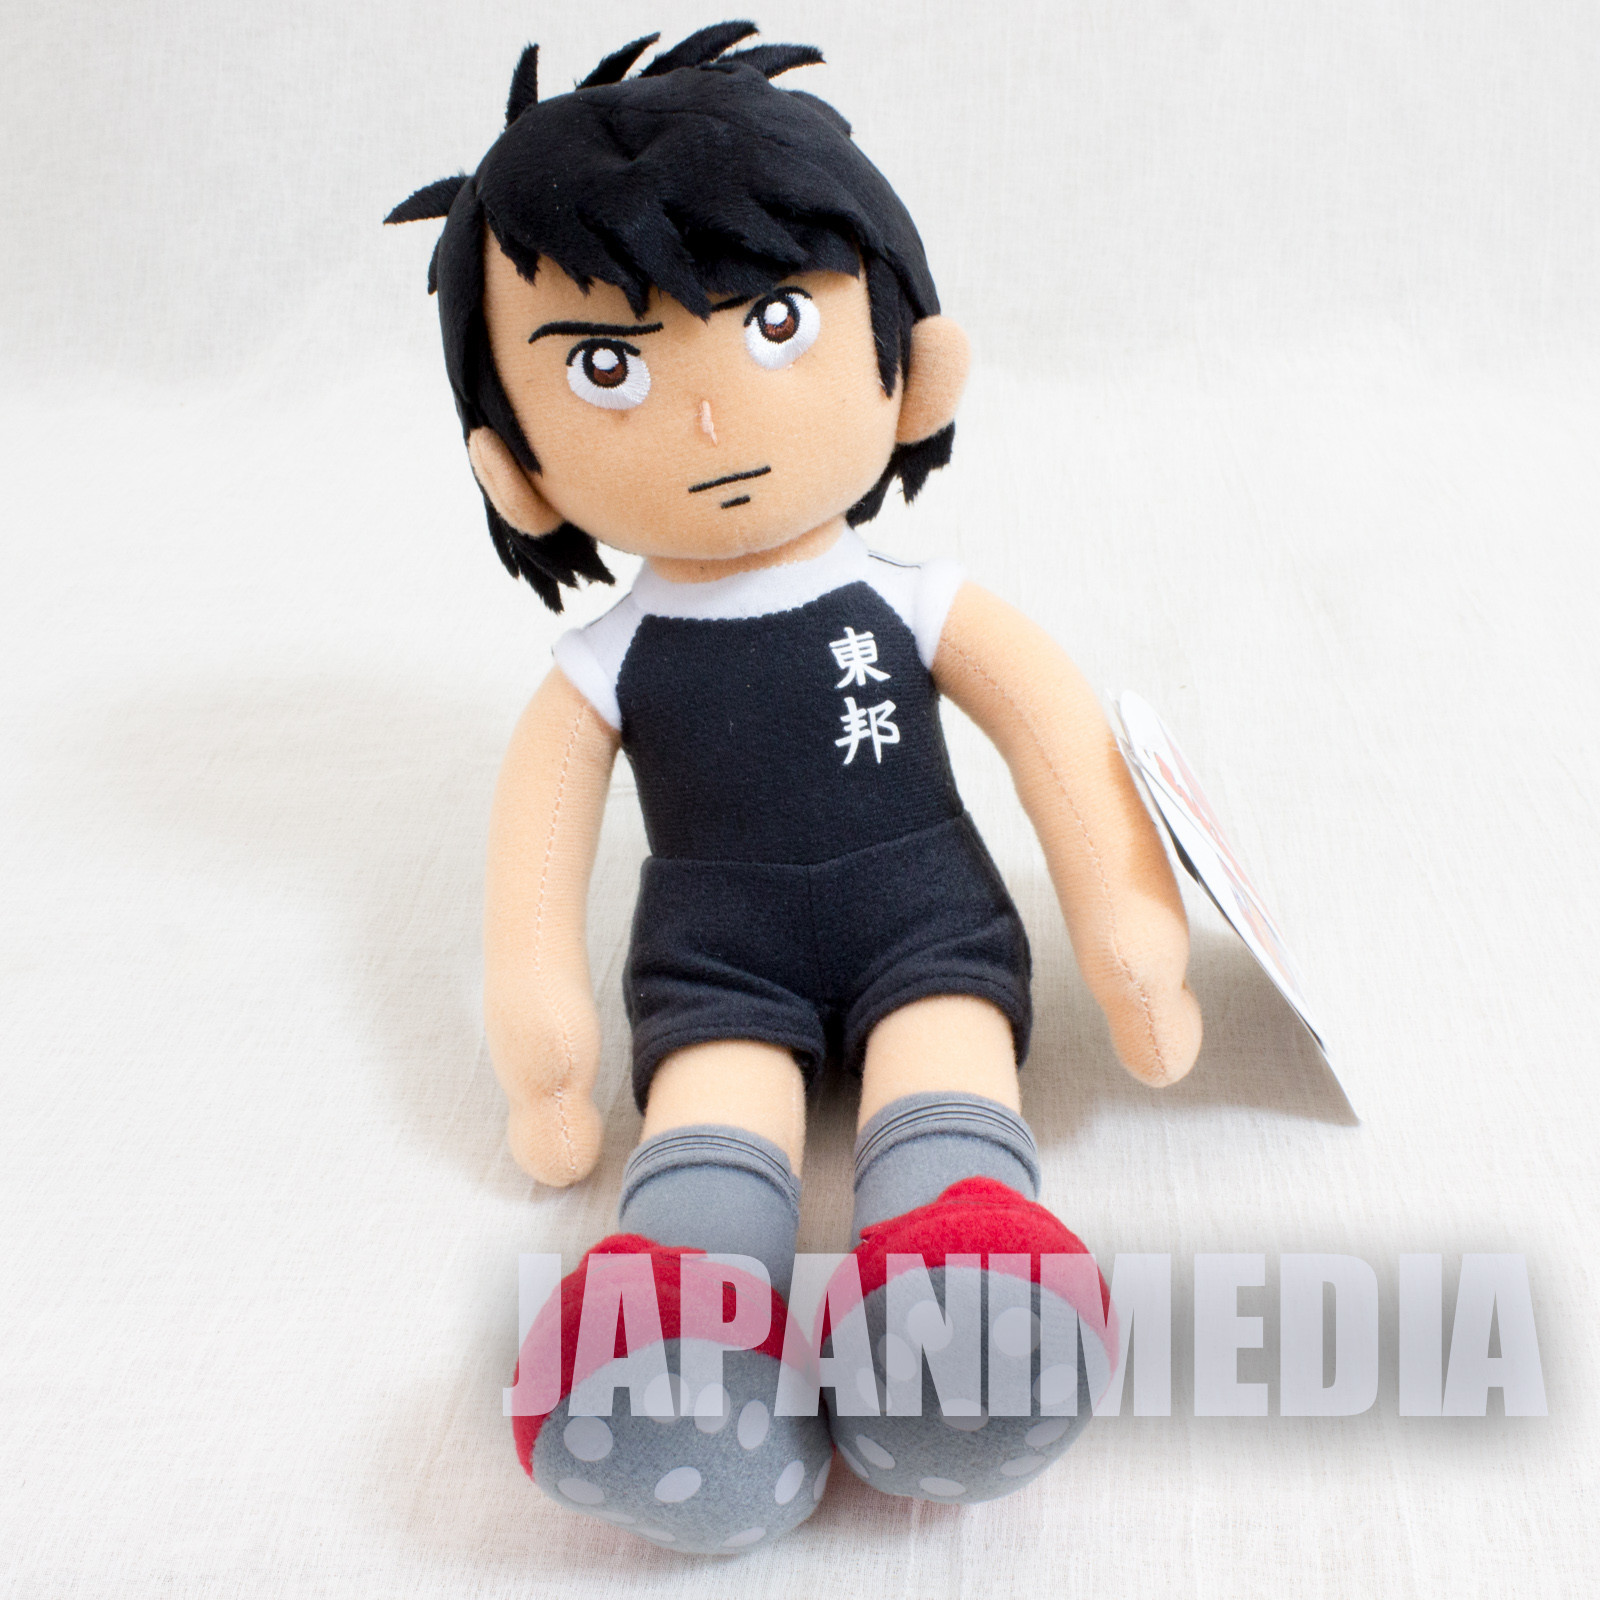 Captain Tsubasa Plush Doll Kojiro Hyuga Sekiguchi JAPAN ANIME MANGA